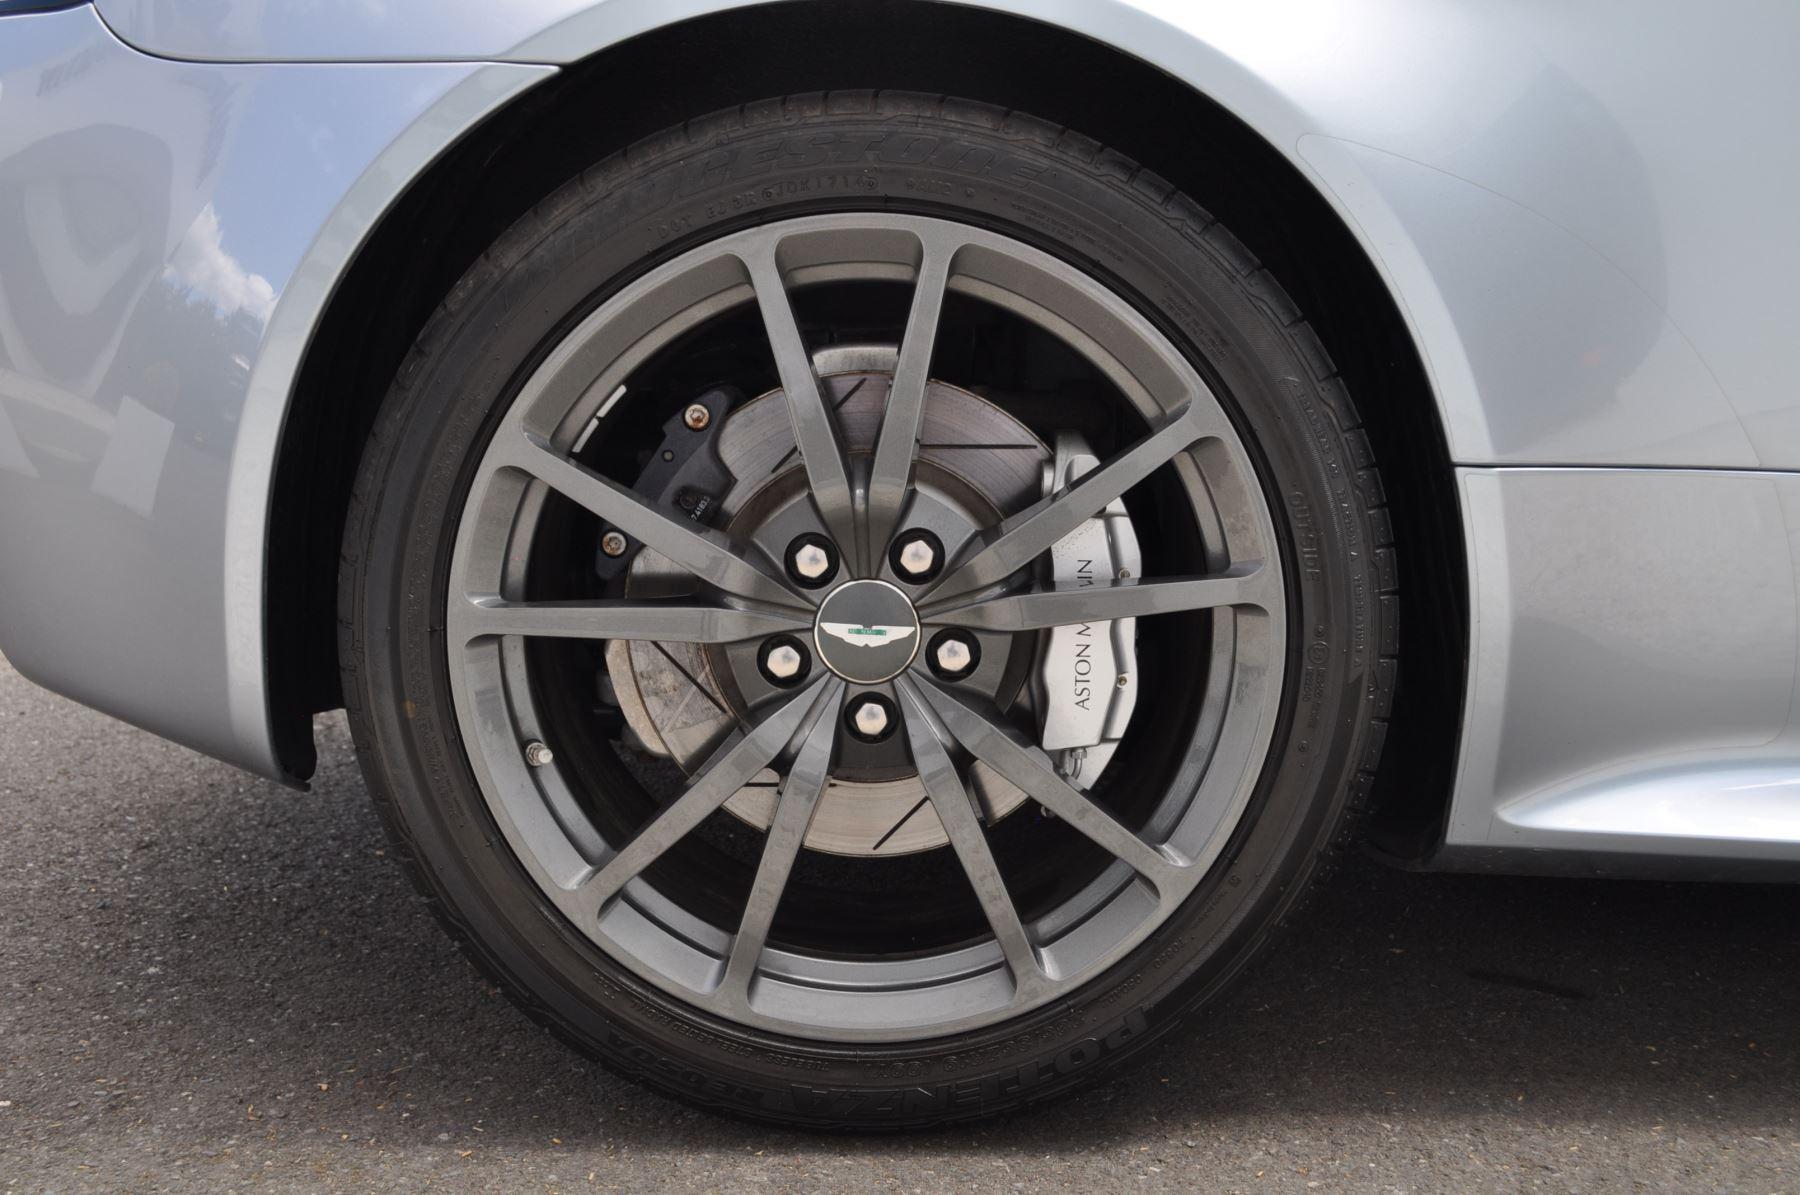 Aston Martin Vantage N430 2dr image 11